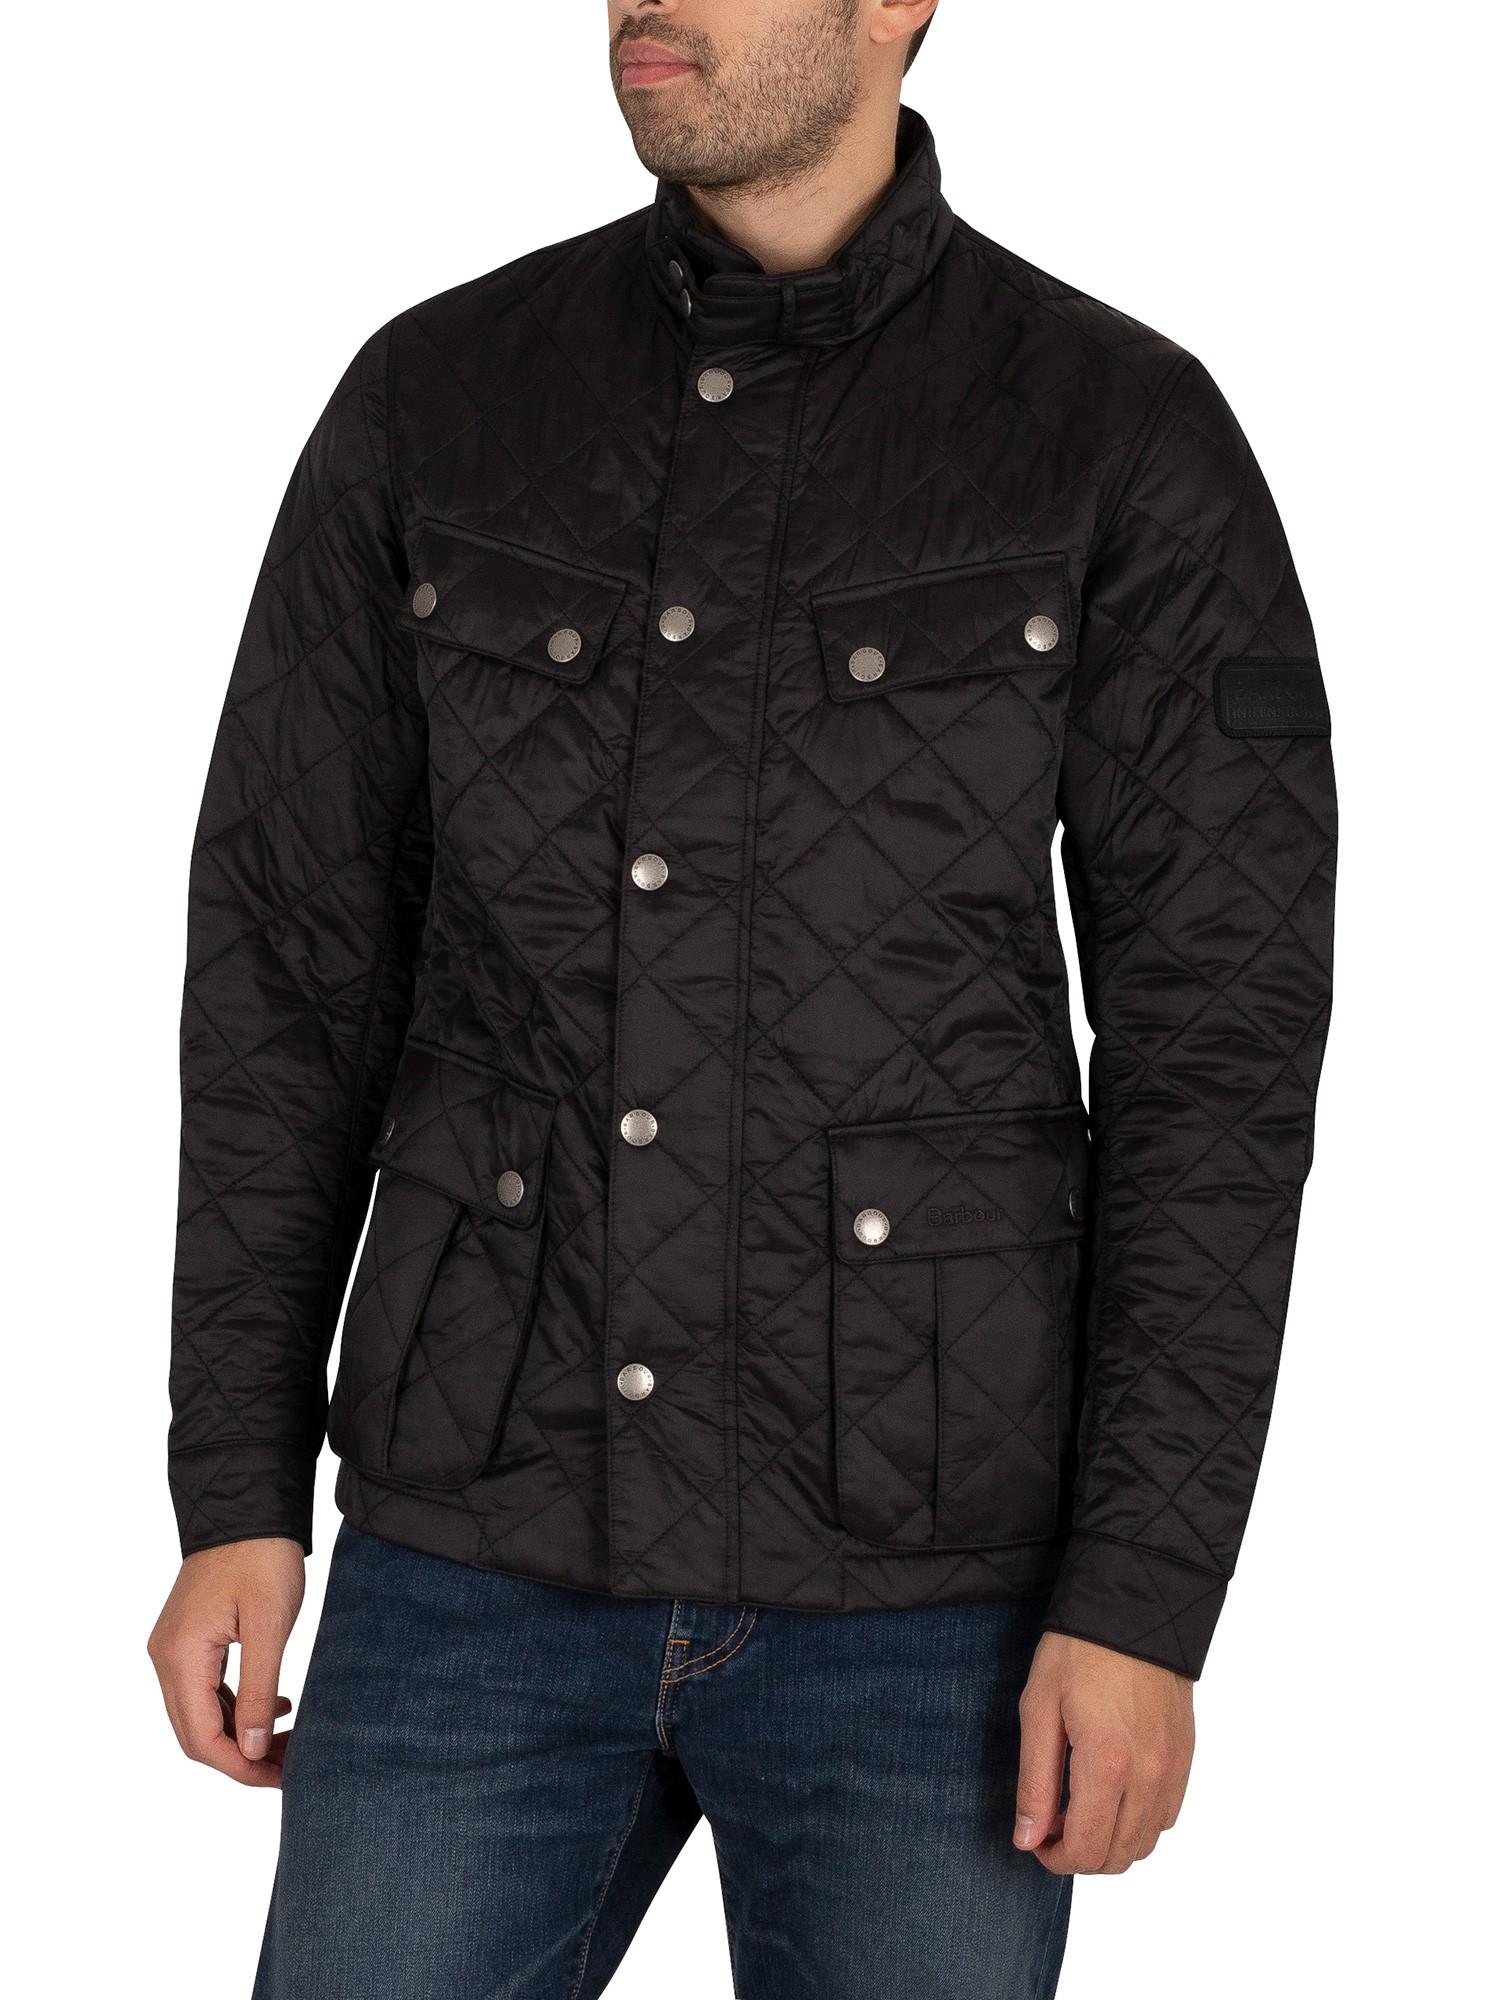 Ariel Quilt Jacket